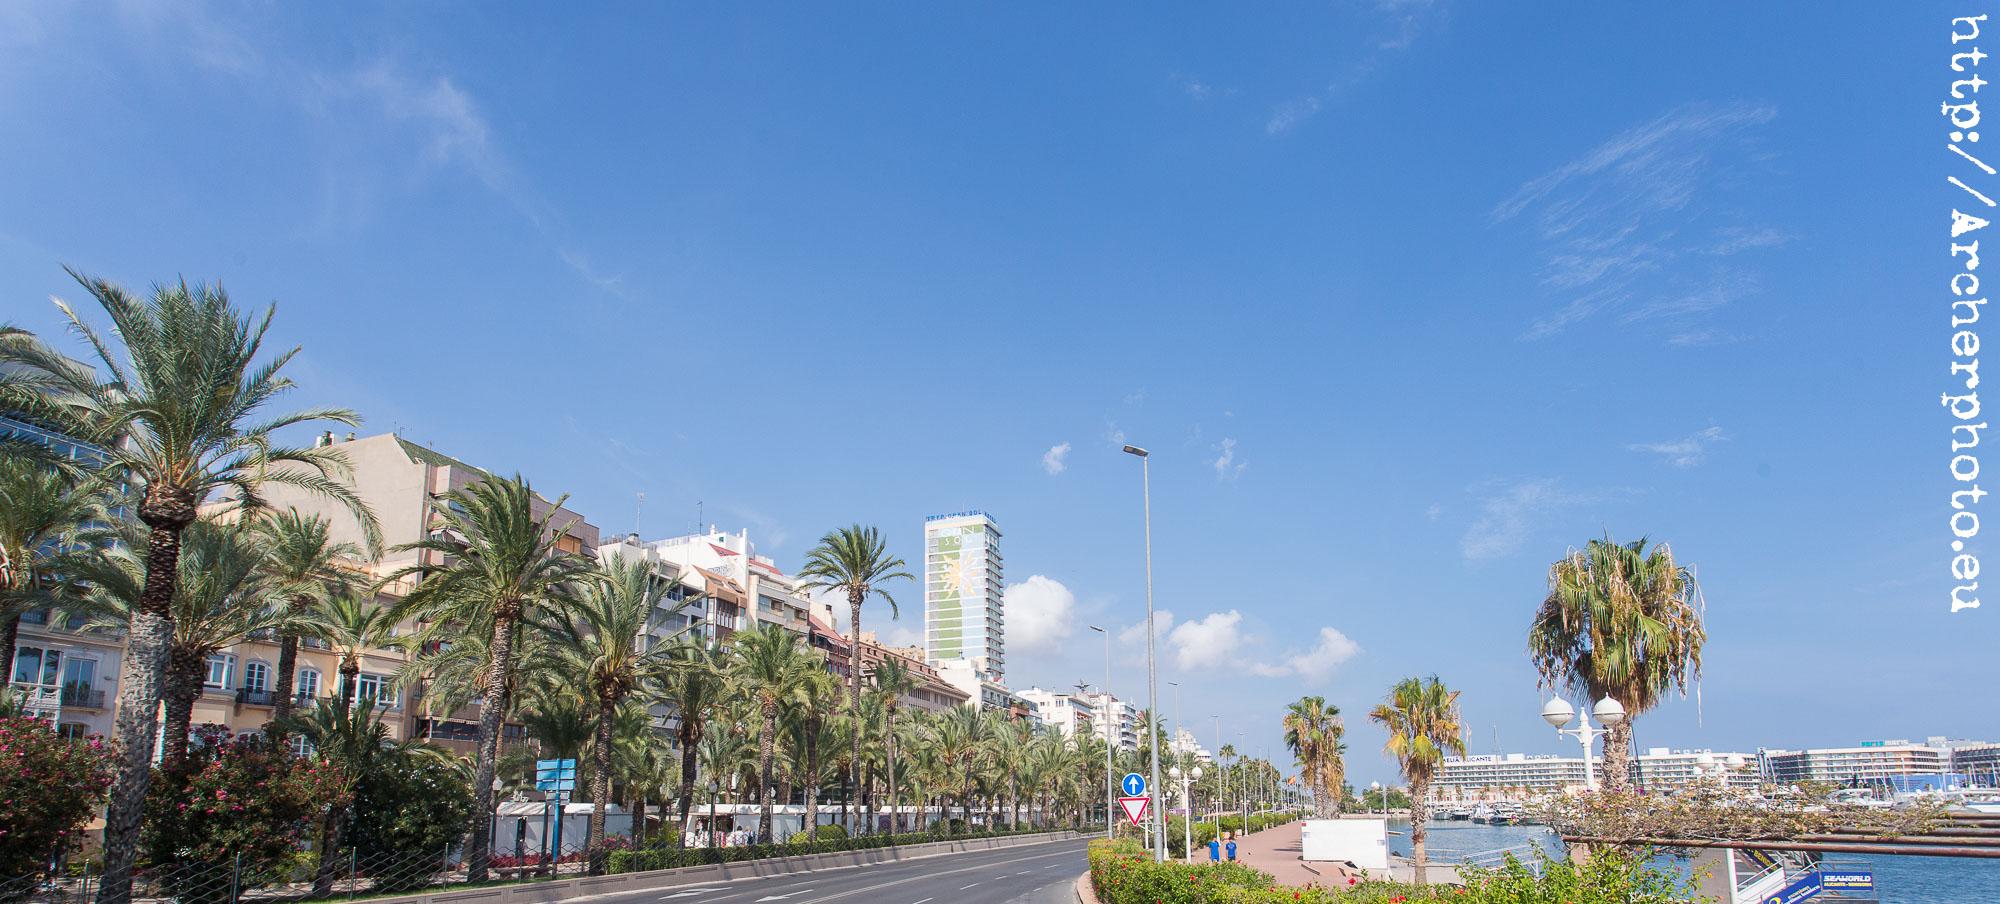 Fotógrafo Archerphoto, imagen de Alicante